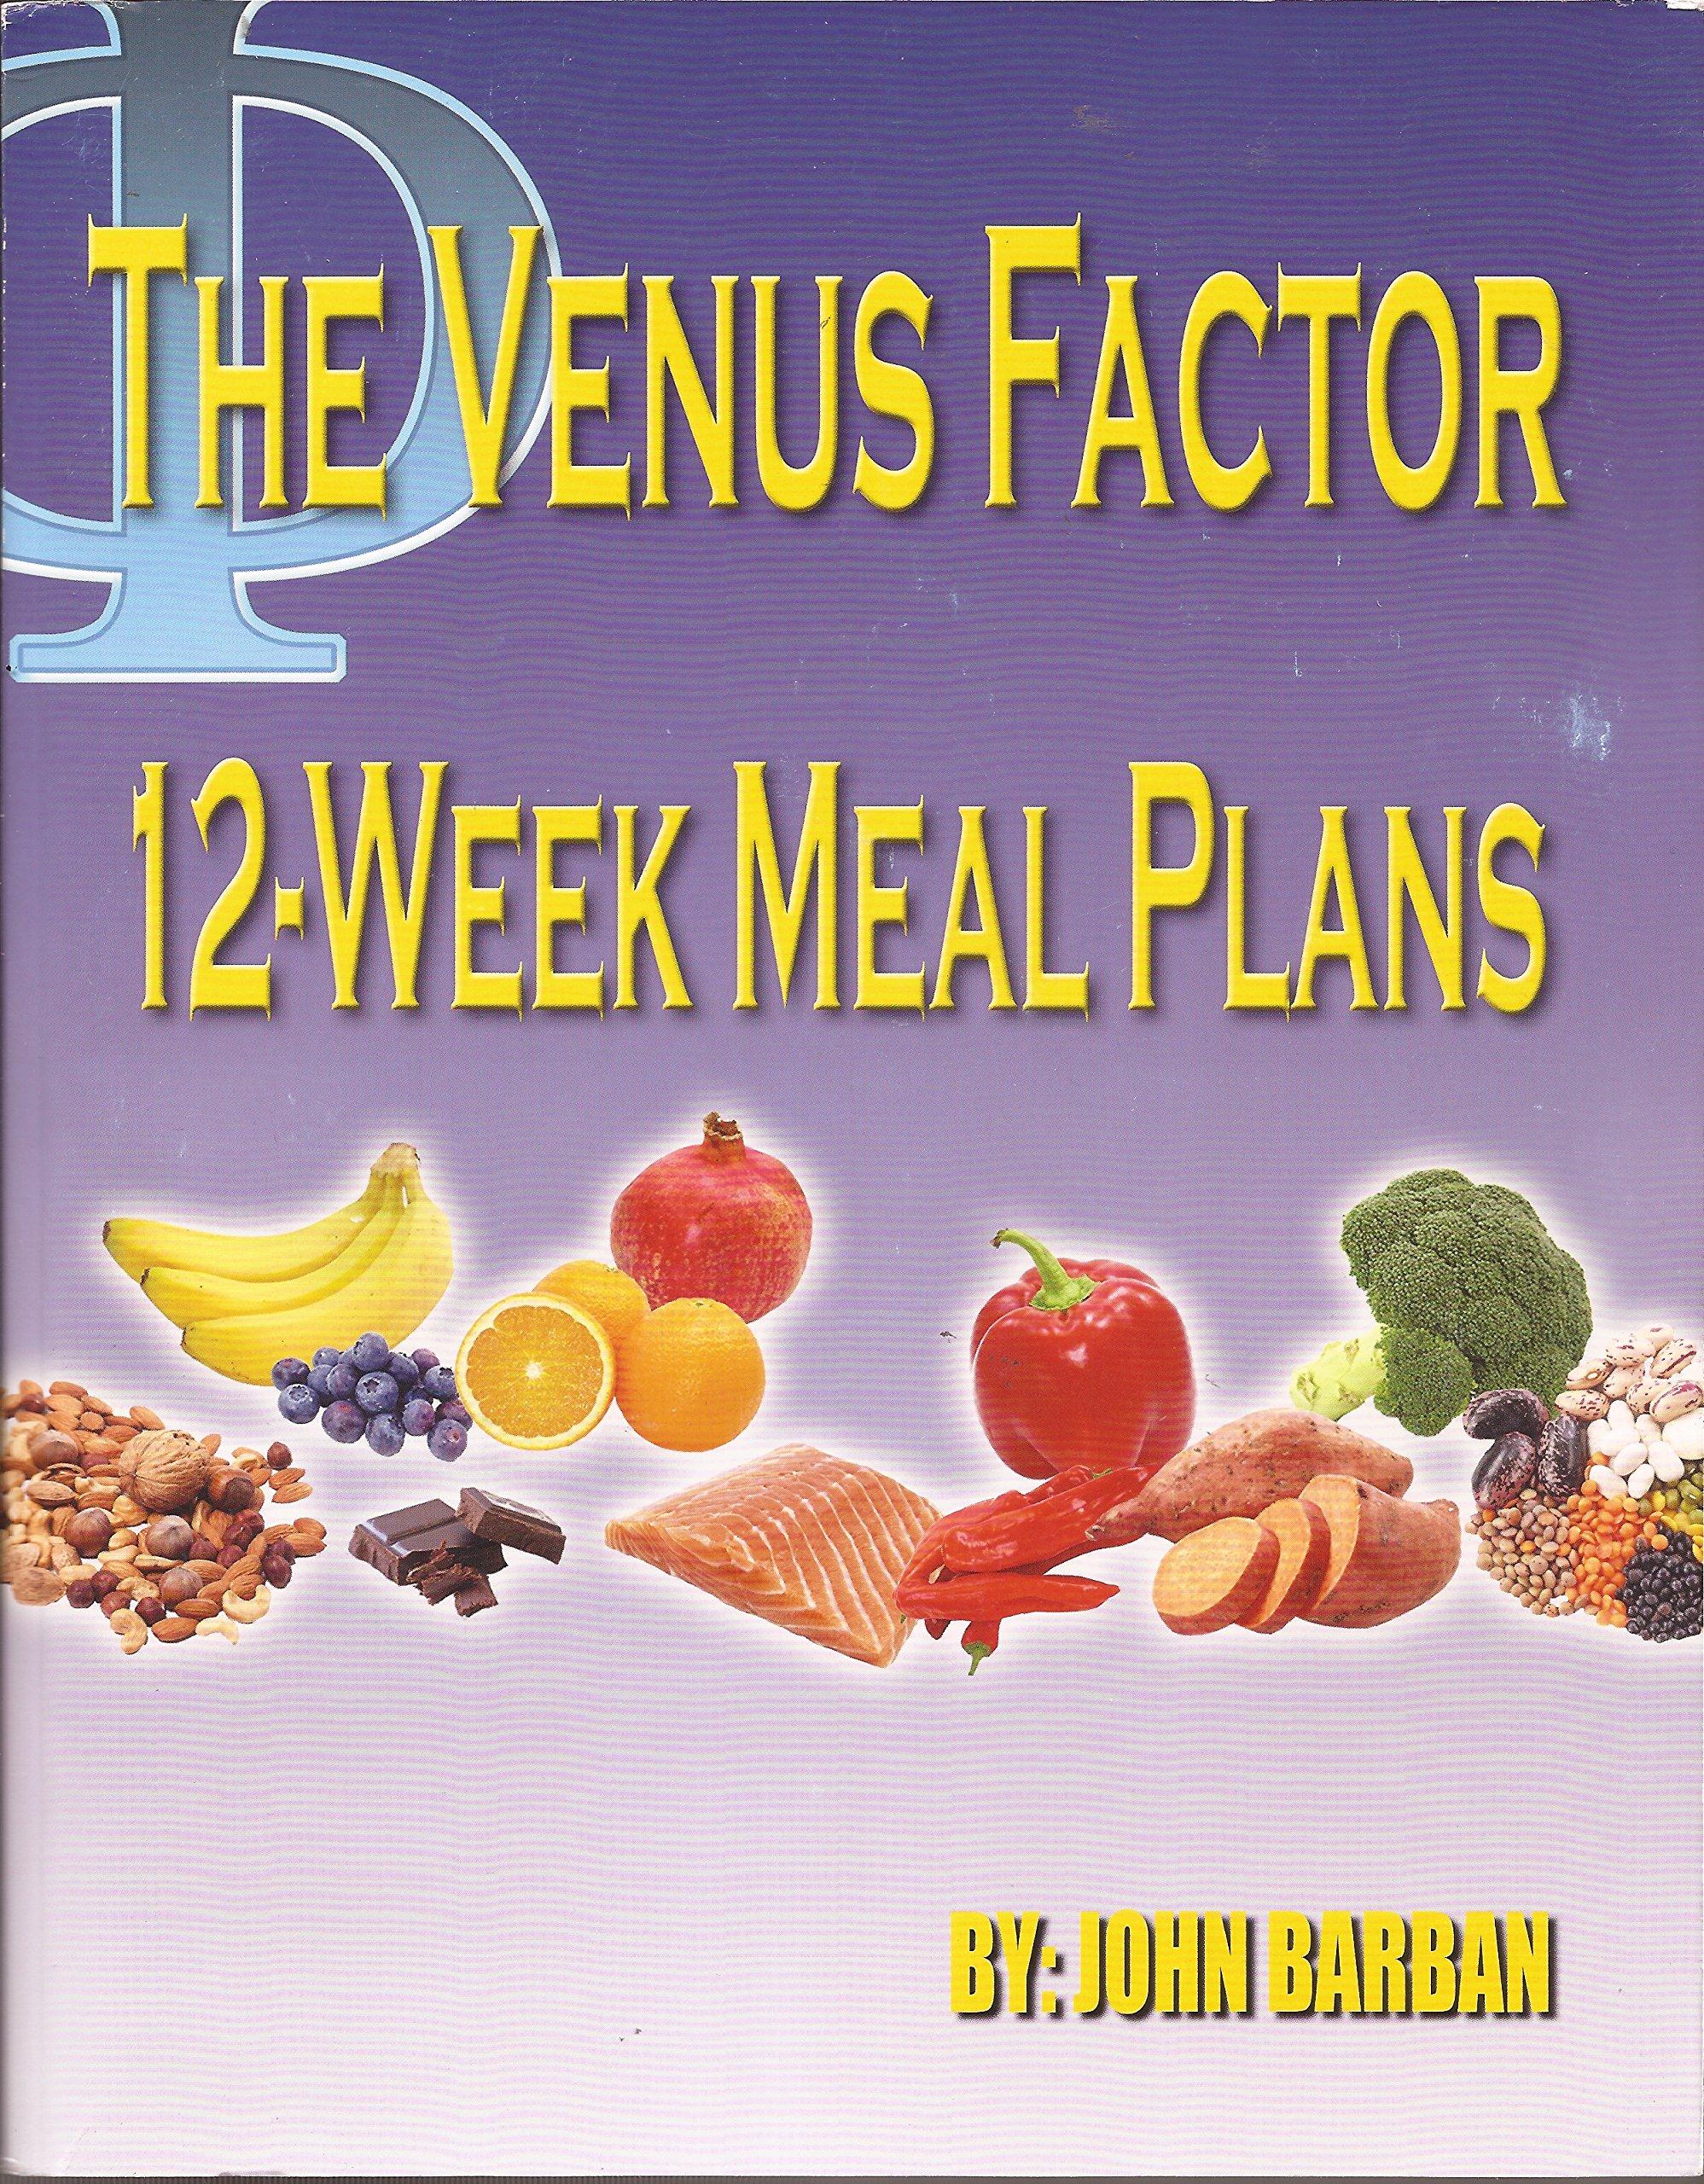 The Venus Factor 12 Week Meal Plan 1000 1800 Calories Per Day Meal Plans Plus Recipe Guide John Barban Amazon Com Books